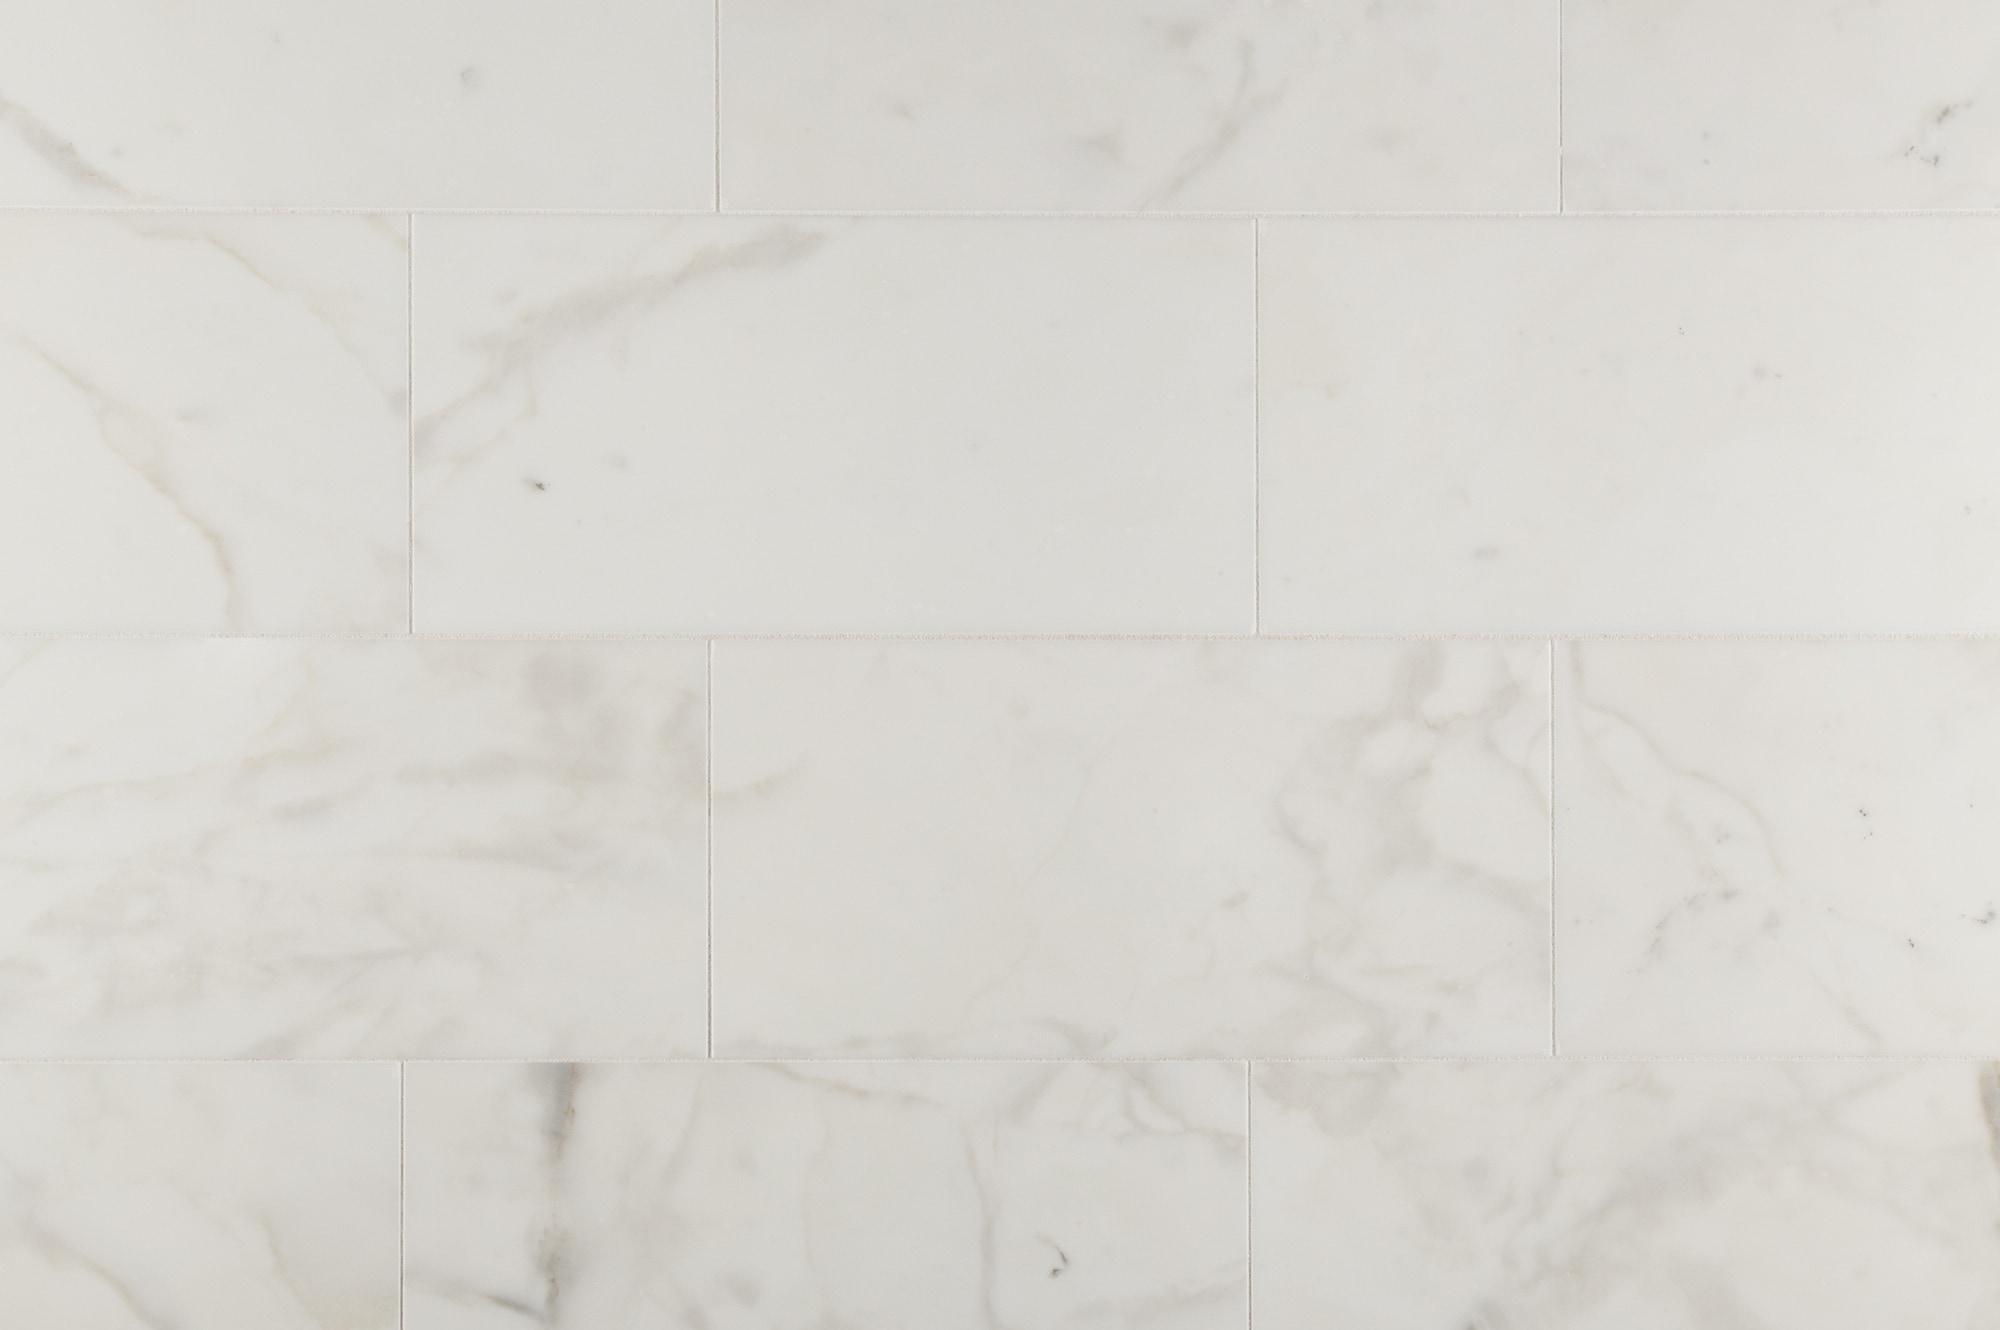 Pedra marble tile coliseum collection calacatta gold 12x24 pedra marble tile coliseum collection calacatta gold 12x24 polished dailygadgetfo Image collections